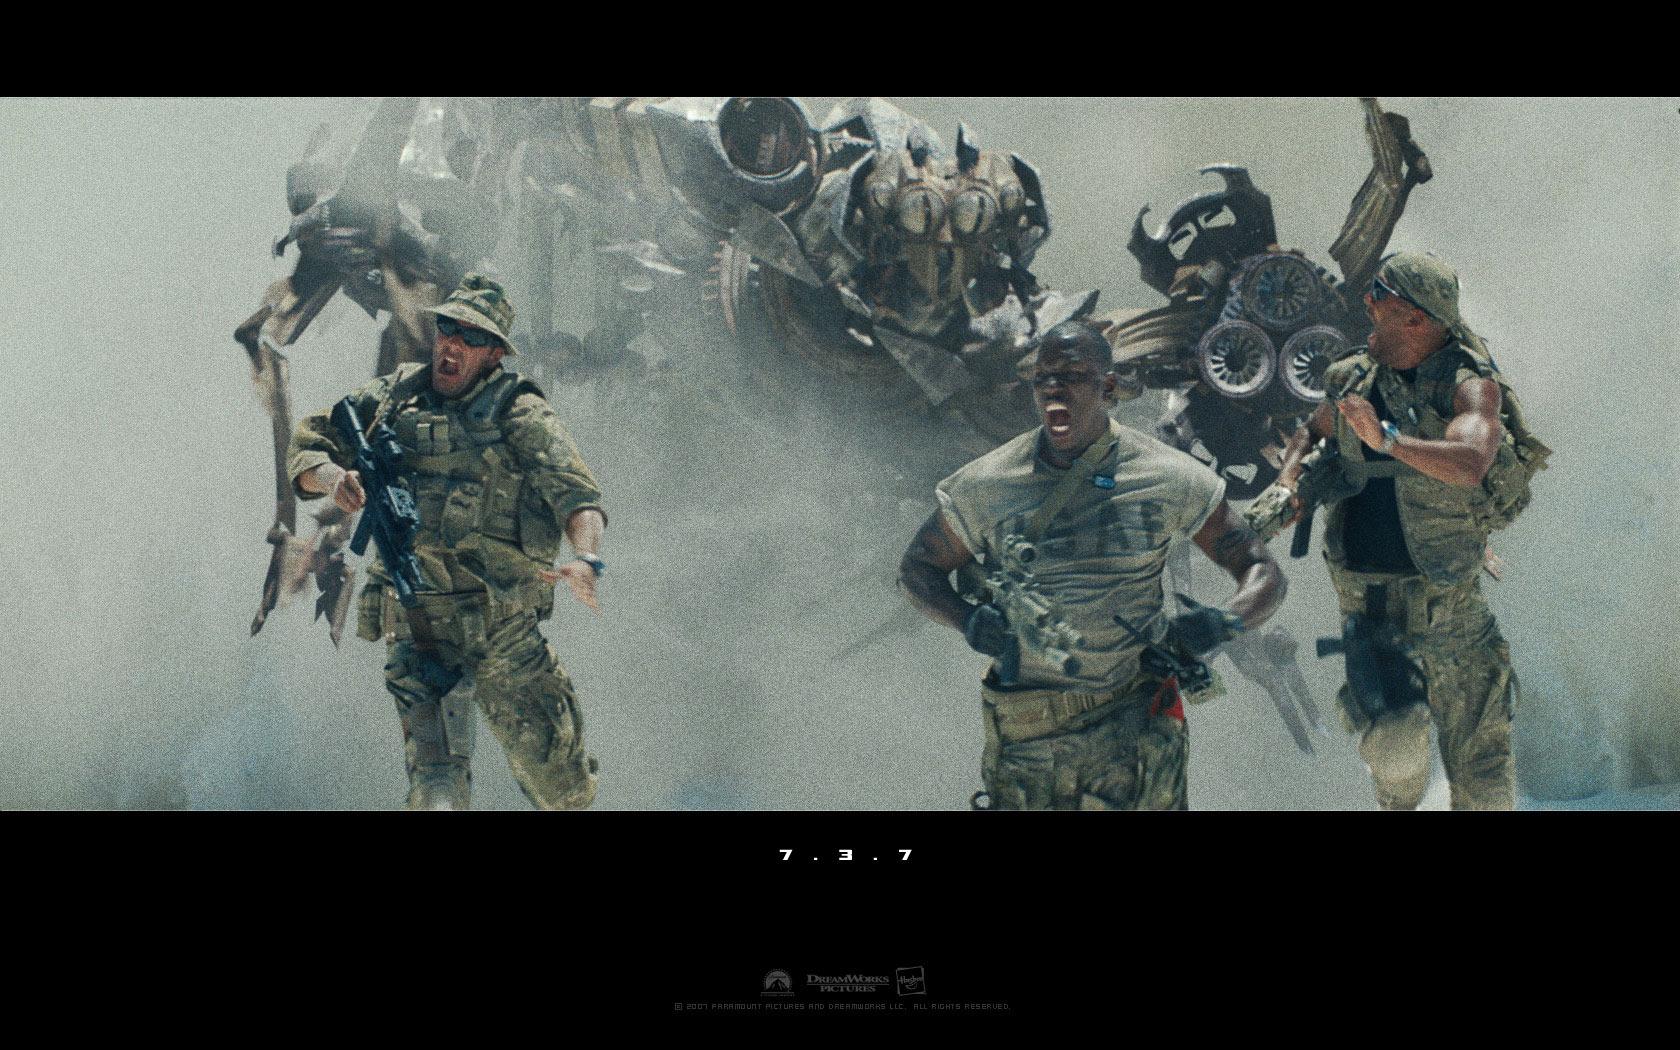 transformers wallpaper widescreen - photo #36